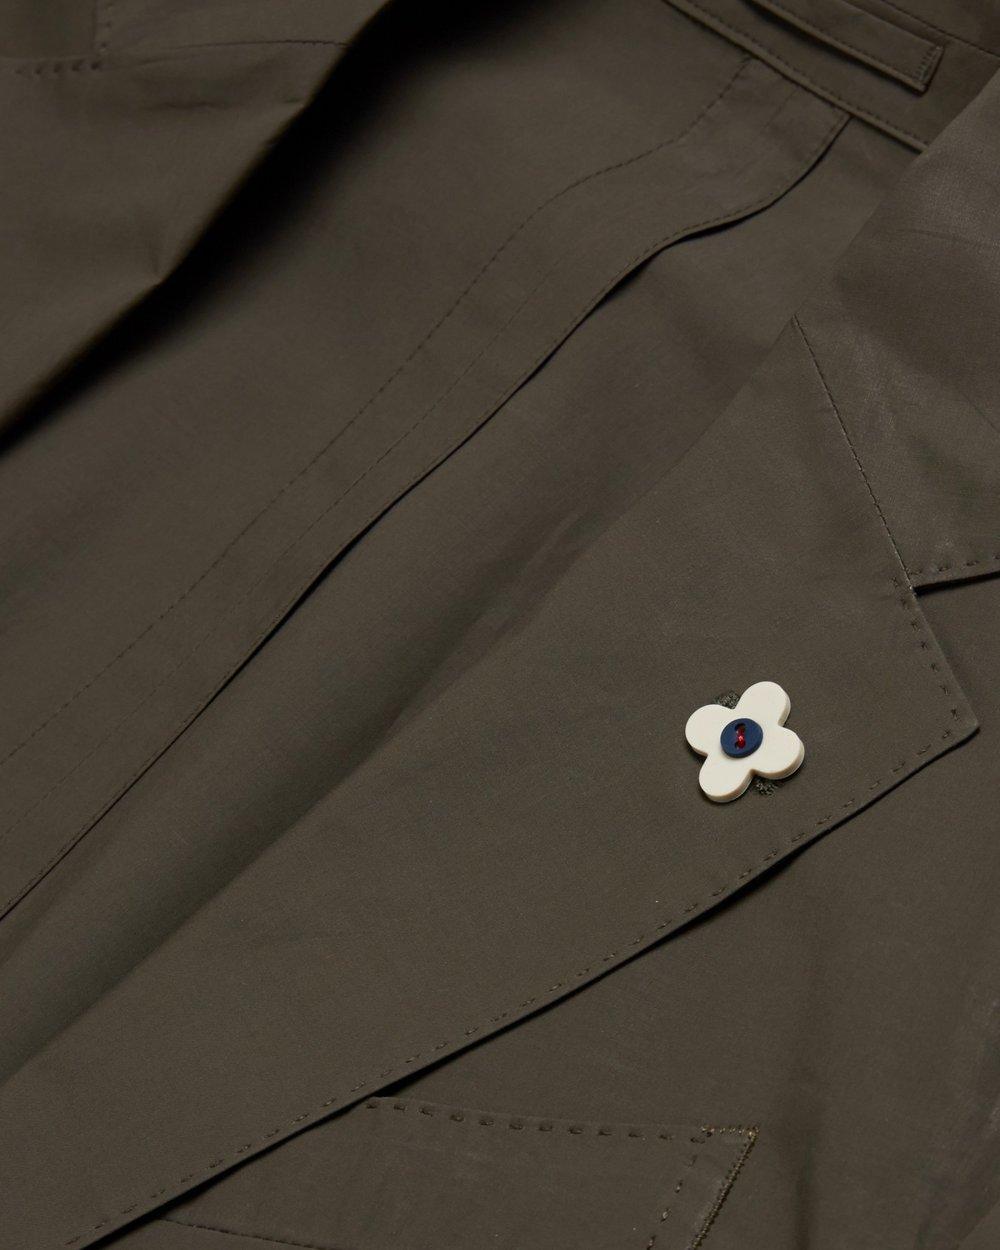 lardini_lightweight_cotton_travel_suit_olive_5.jpg